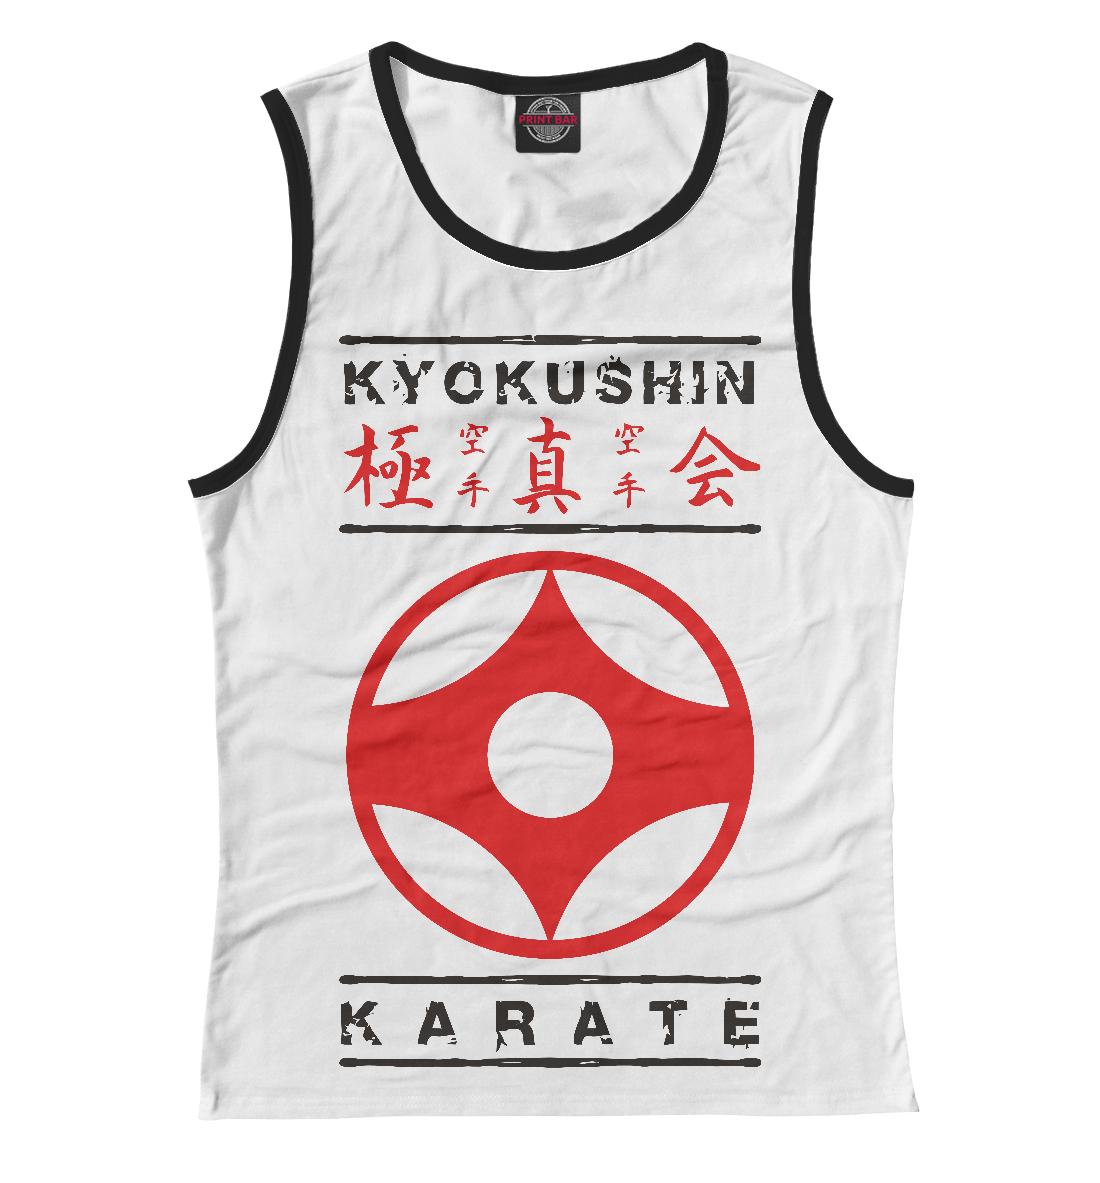 Купить Kyokushin Karate, Printbar, Майки, EDI-496527-may-1